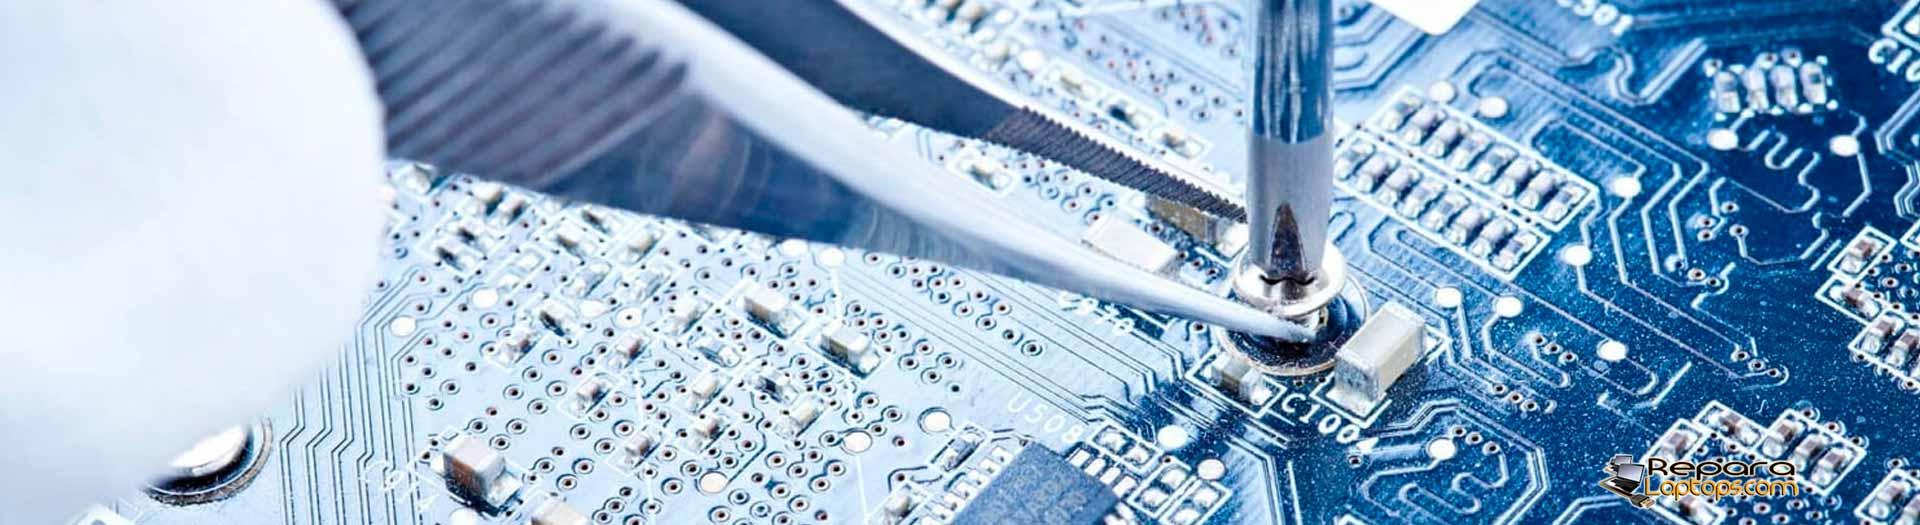 Pantallas Led LCD teclados baterias reparacion tarjeta madre HP DELL ACER LENOVO TOSHIBA APPLE MAC MACBOOK